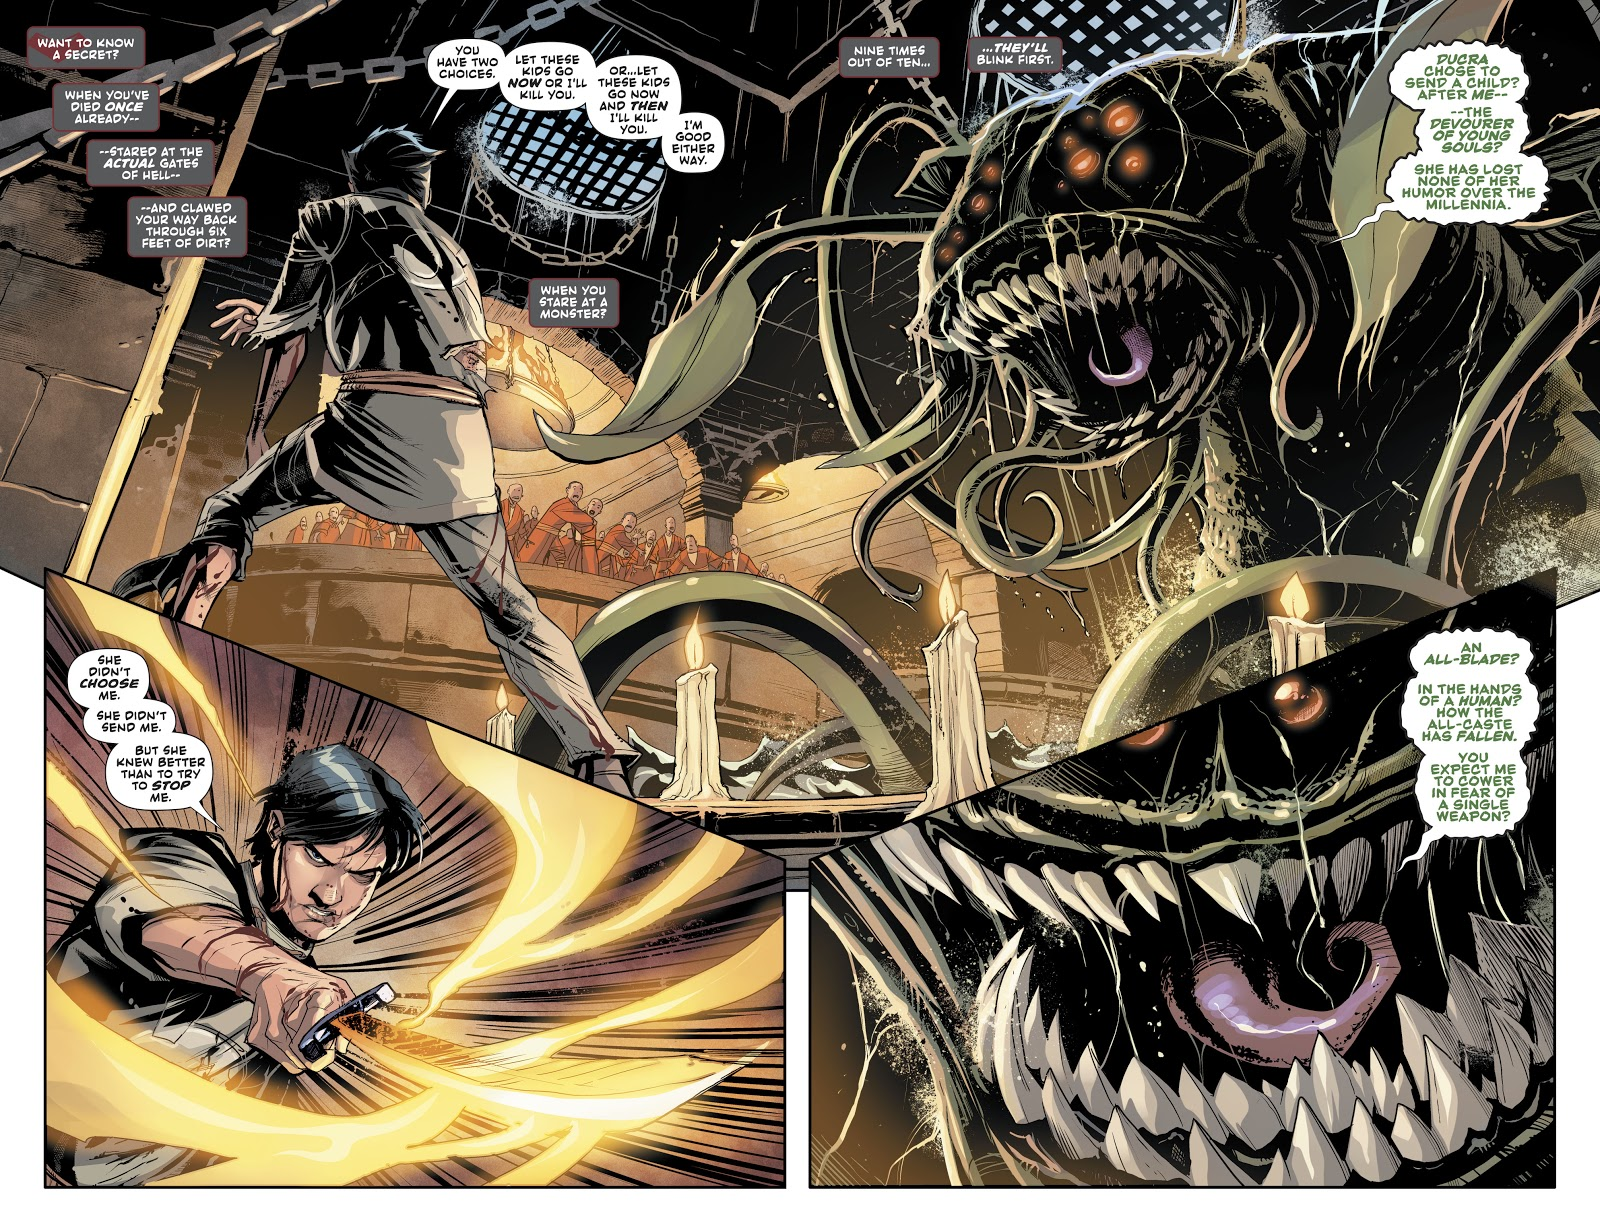 Jason Todd Defeats The Behemoth